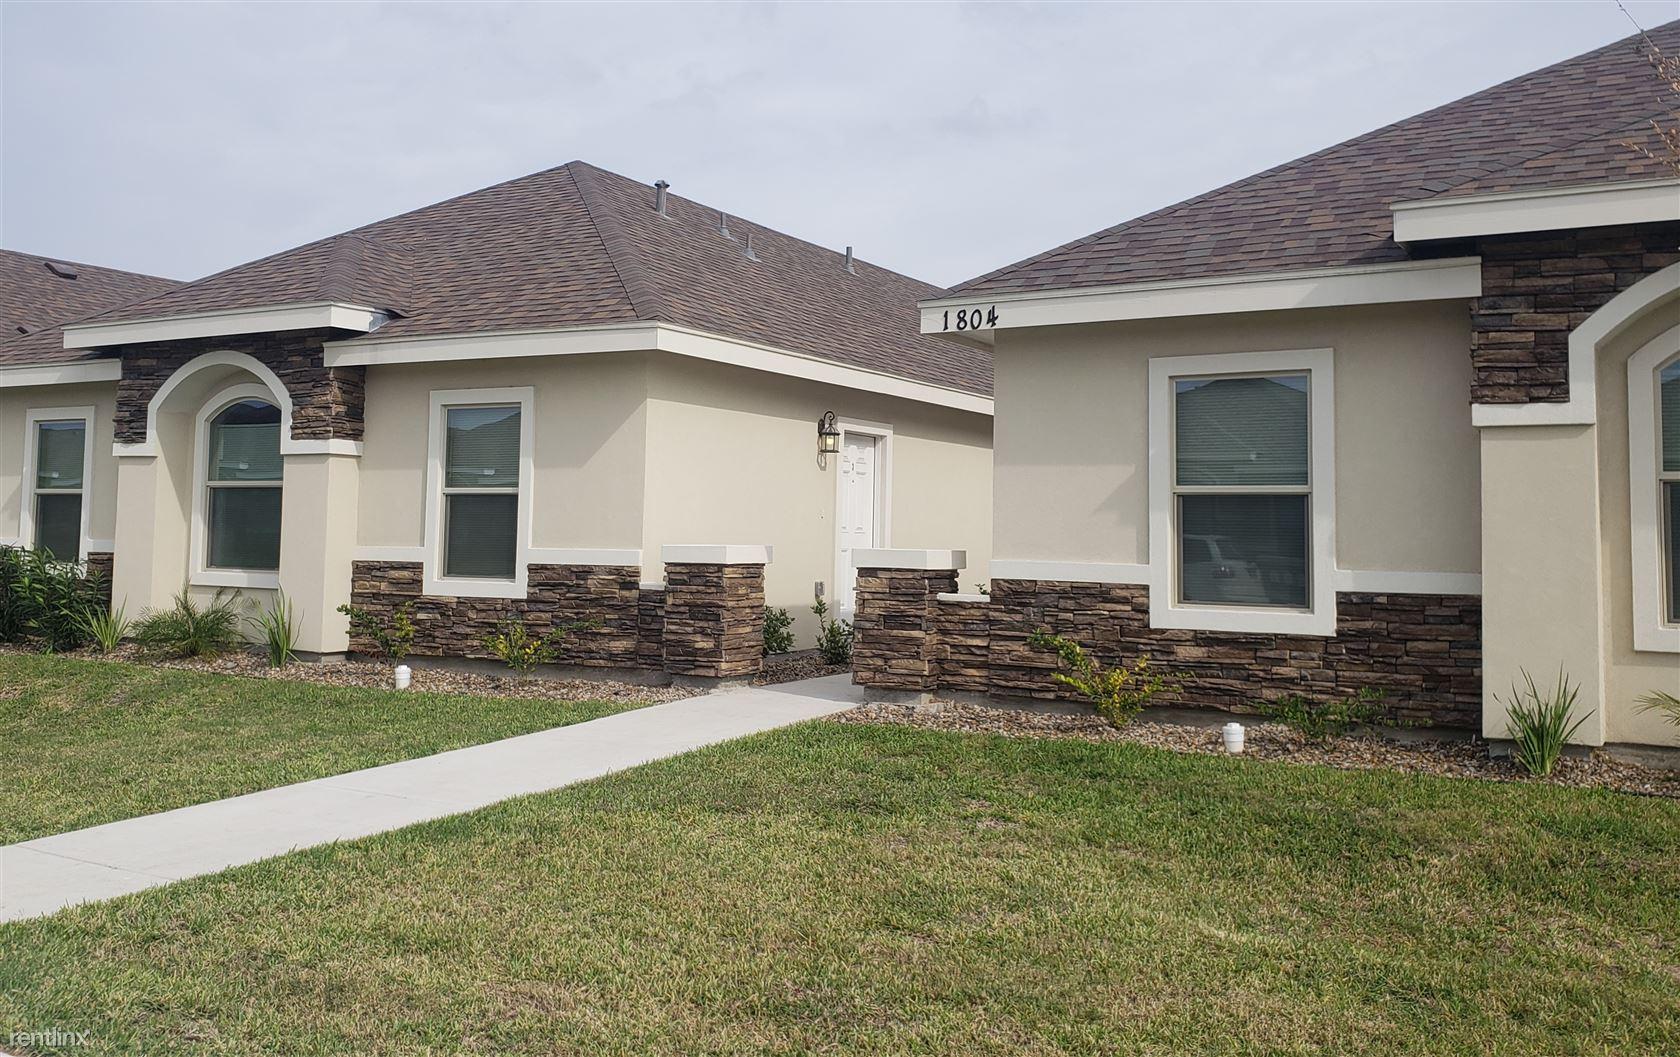 1804 Jackson St, Weslaco, TX - $975